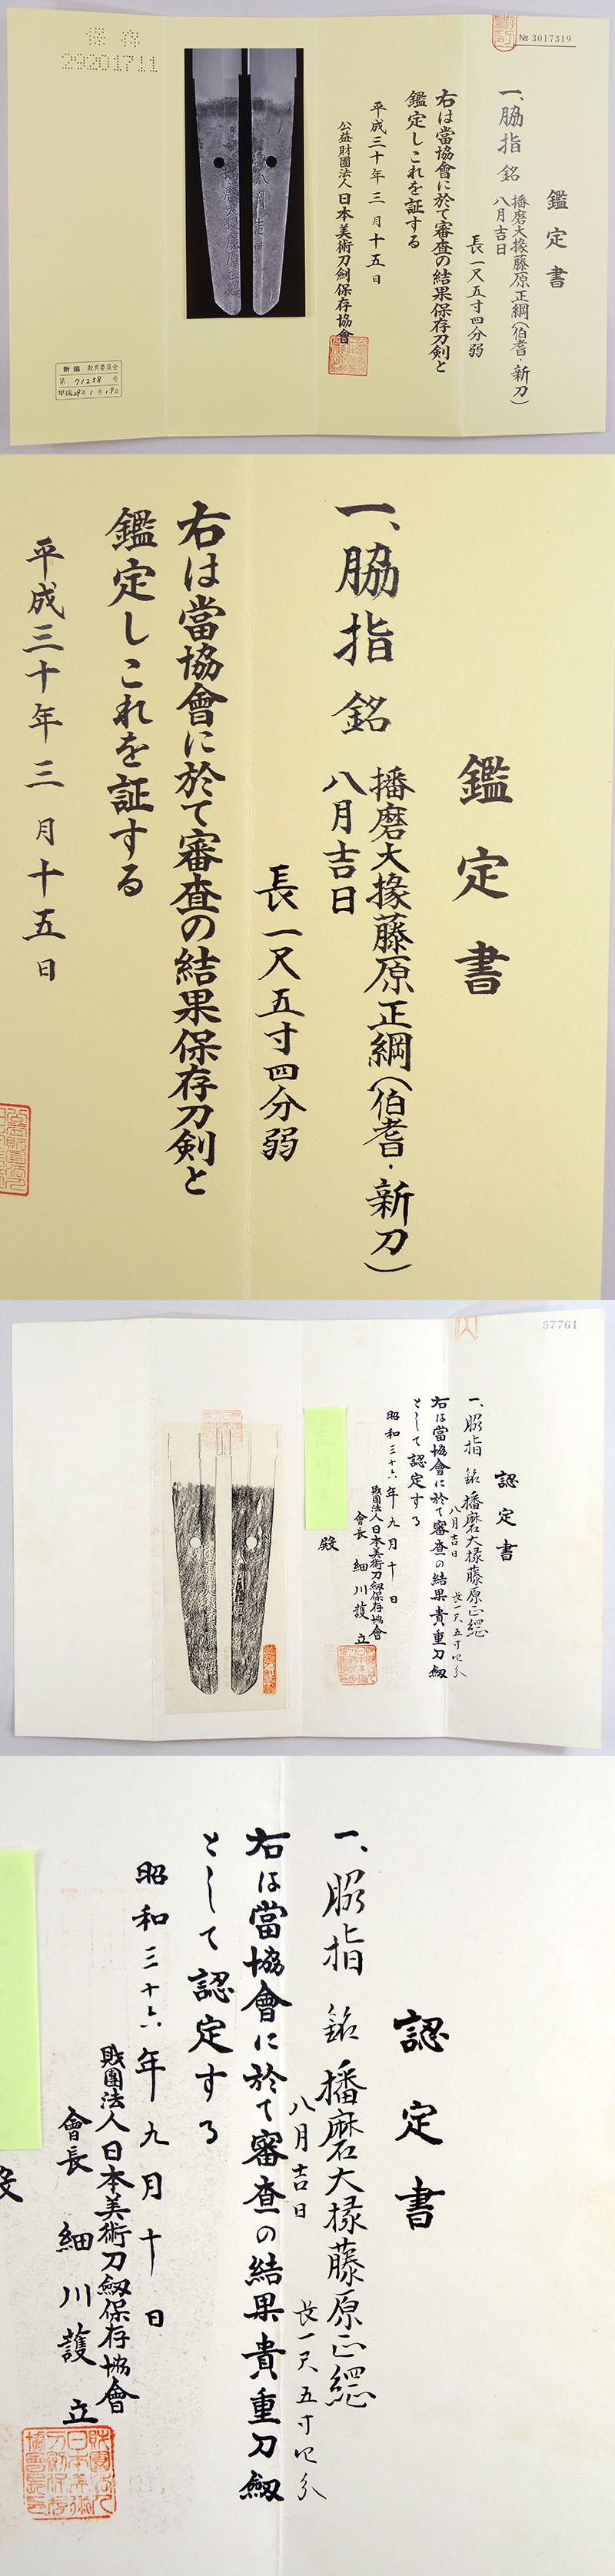 播磨大掾藤原正綱 Picture of Certificate